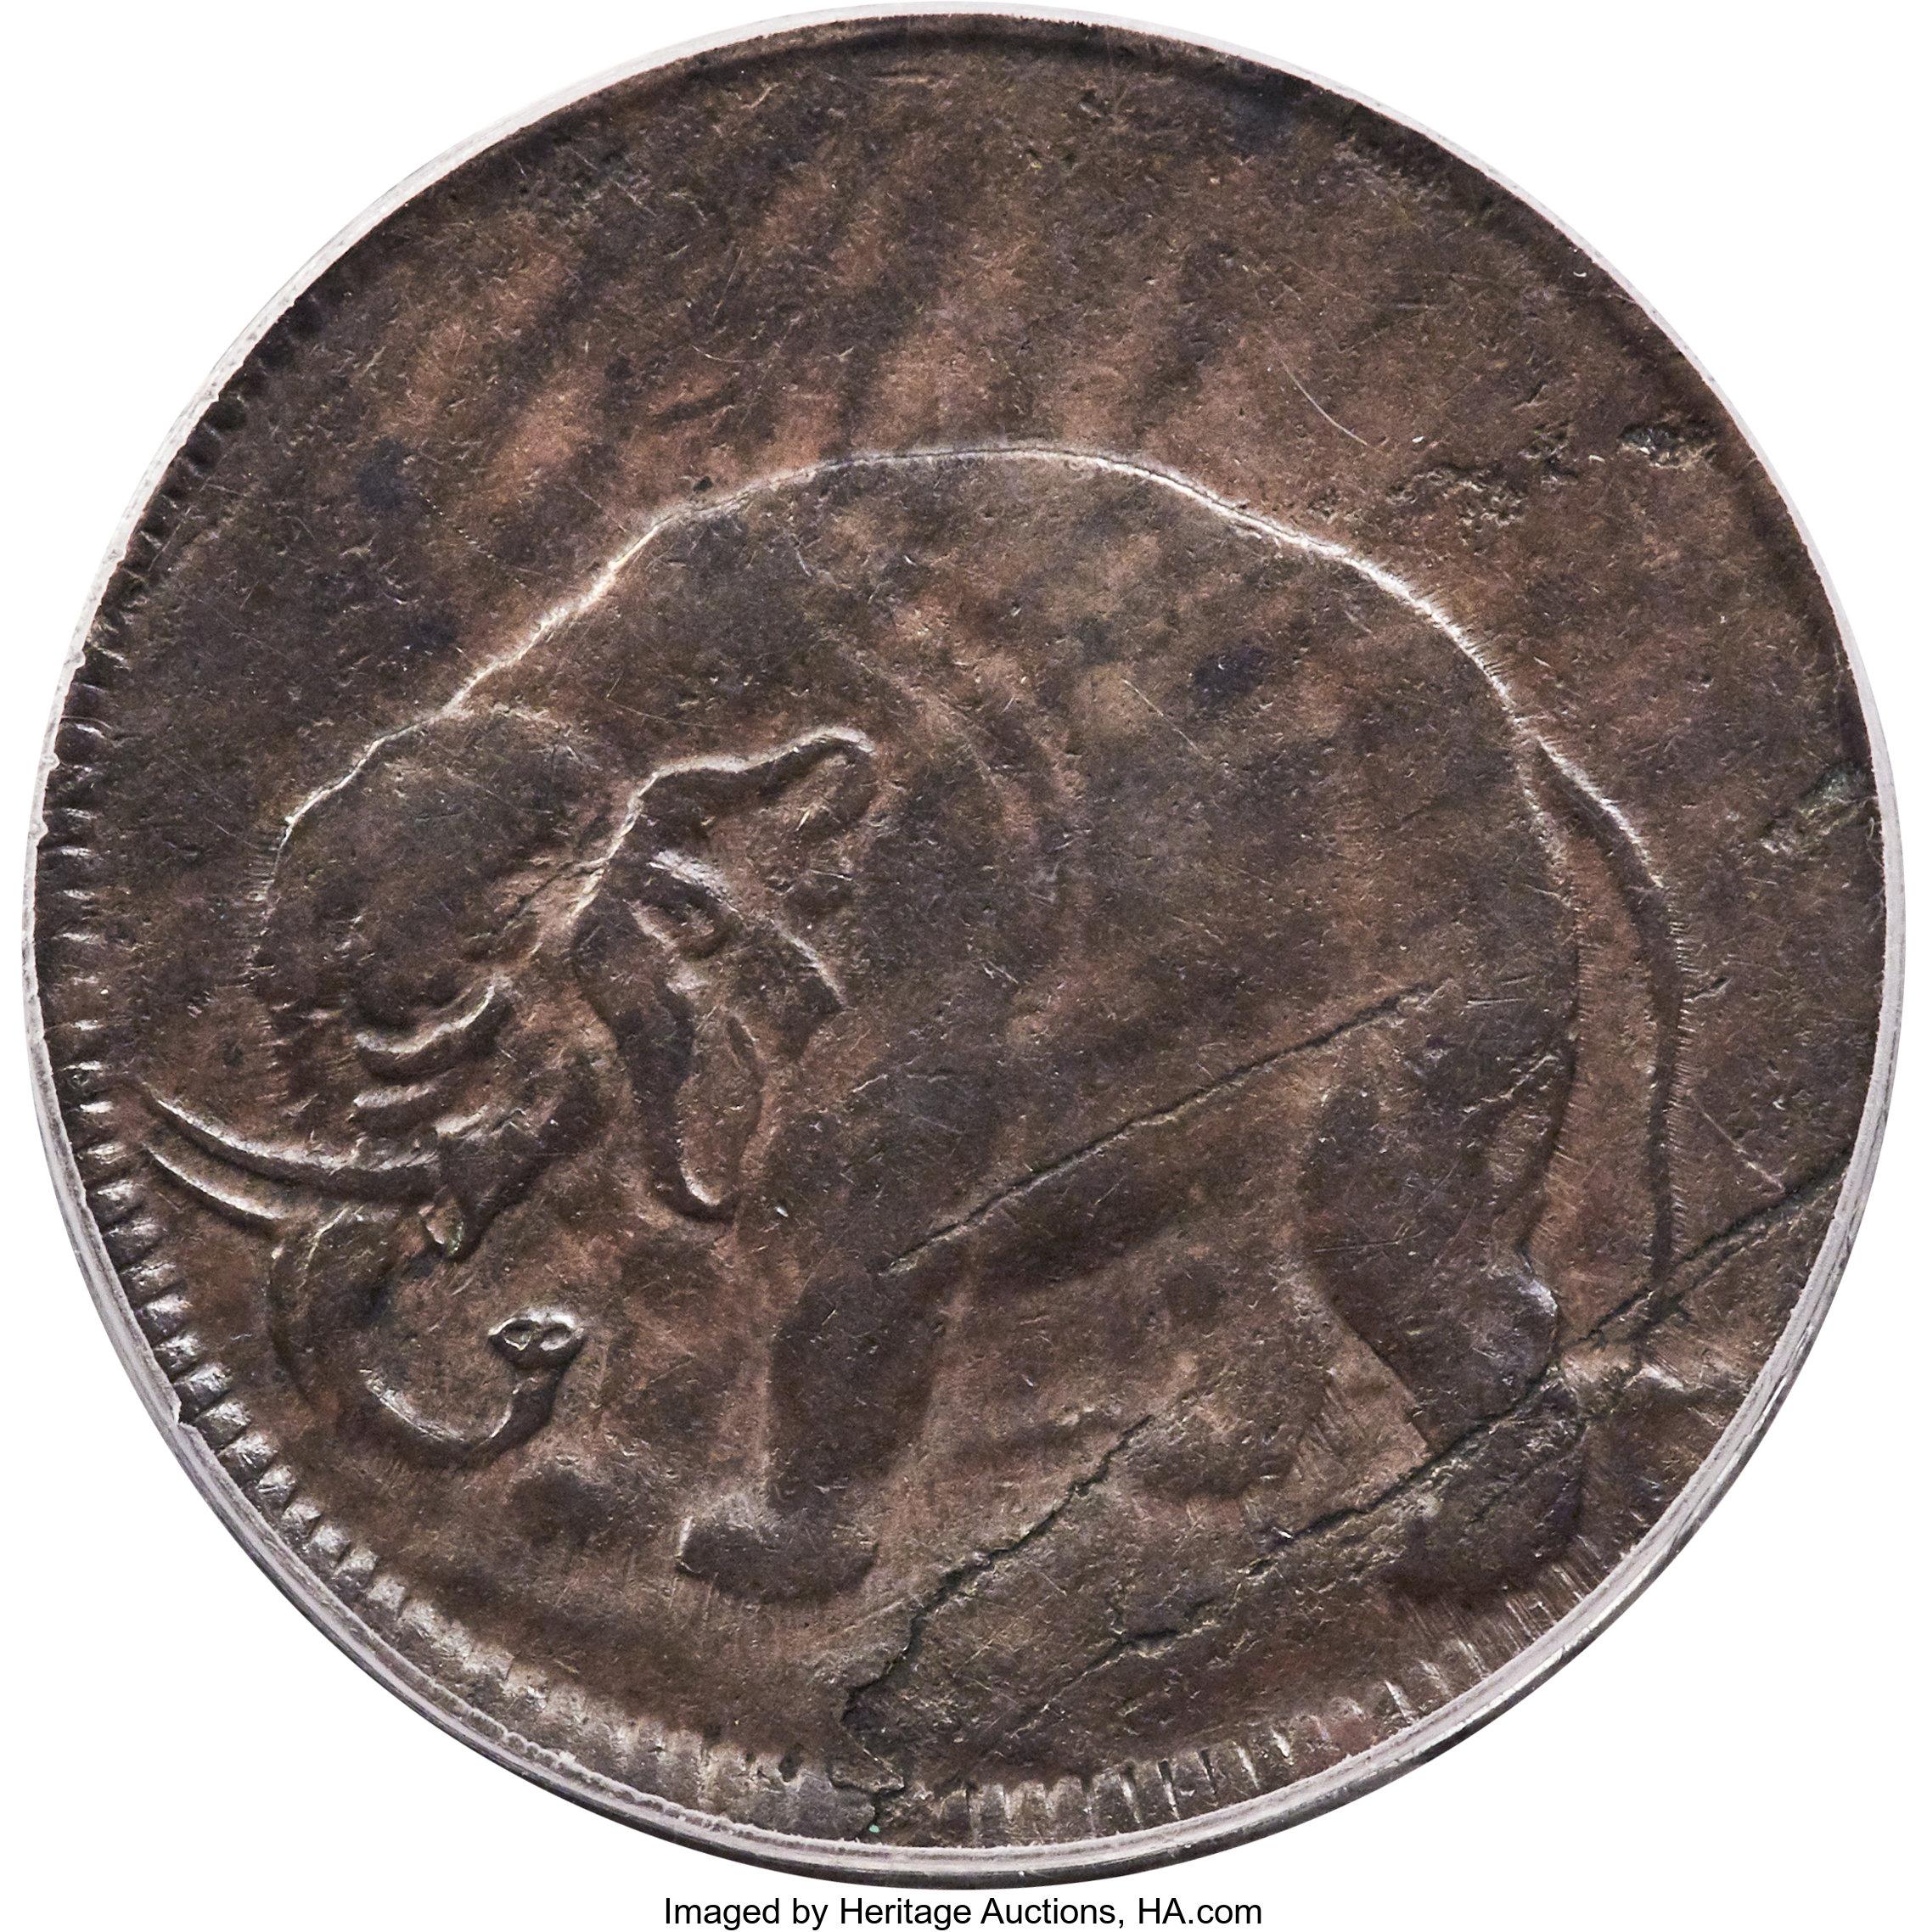 sample image for Elephant LONDON, Thin Plan BN